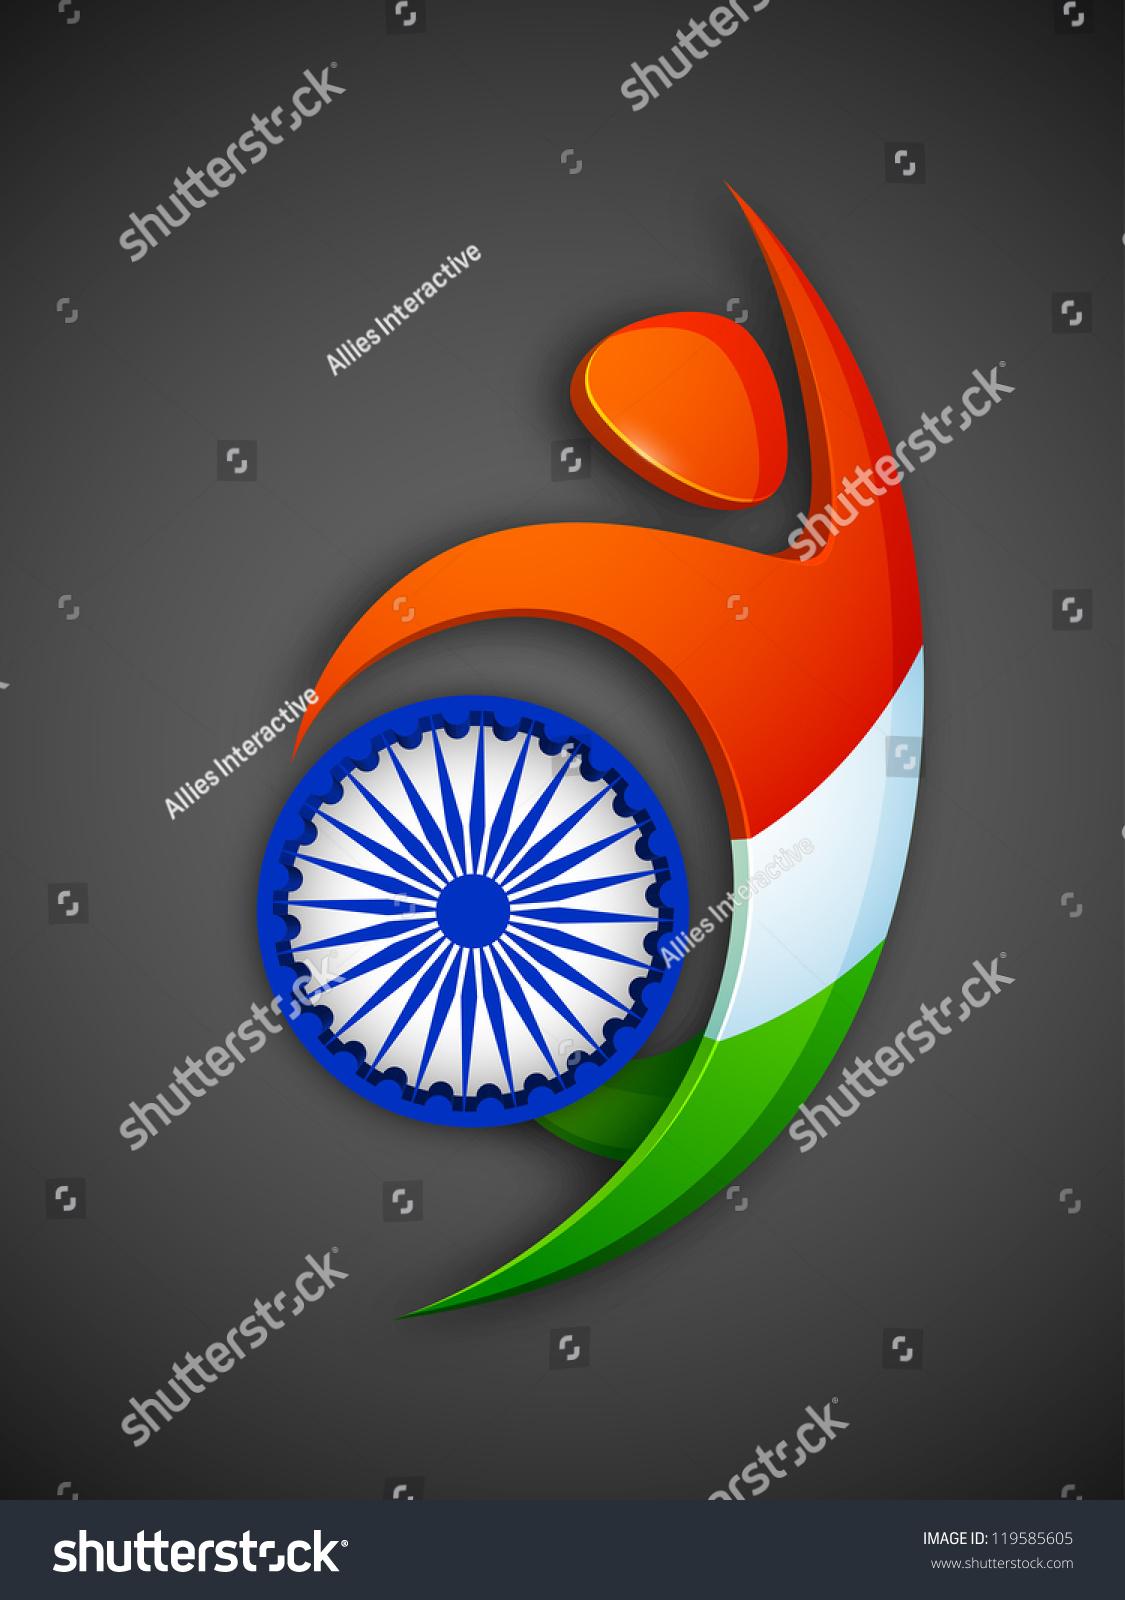 national flag in hindi pdf